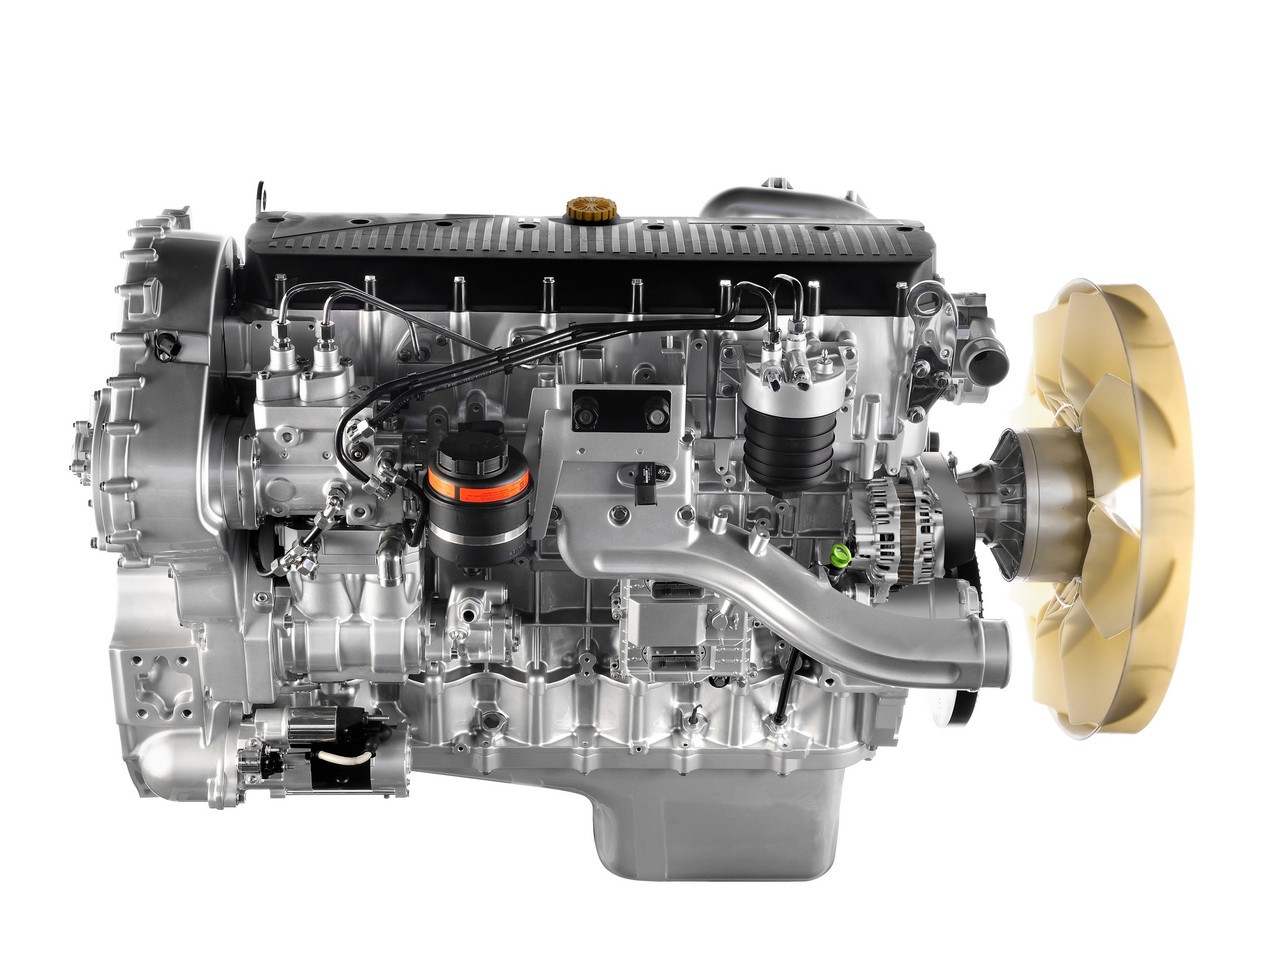 Двигатель Iveco Cursor 9 F3BE0681B, Iveco Cursor 9 F3BE0681C, Iveco NEF - фото 5